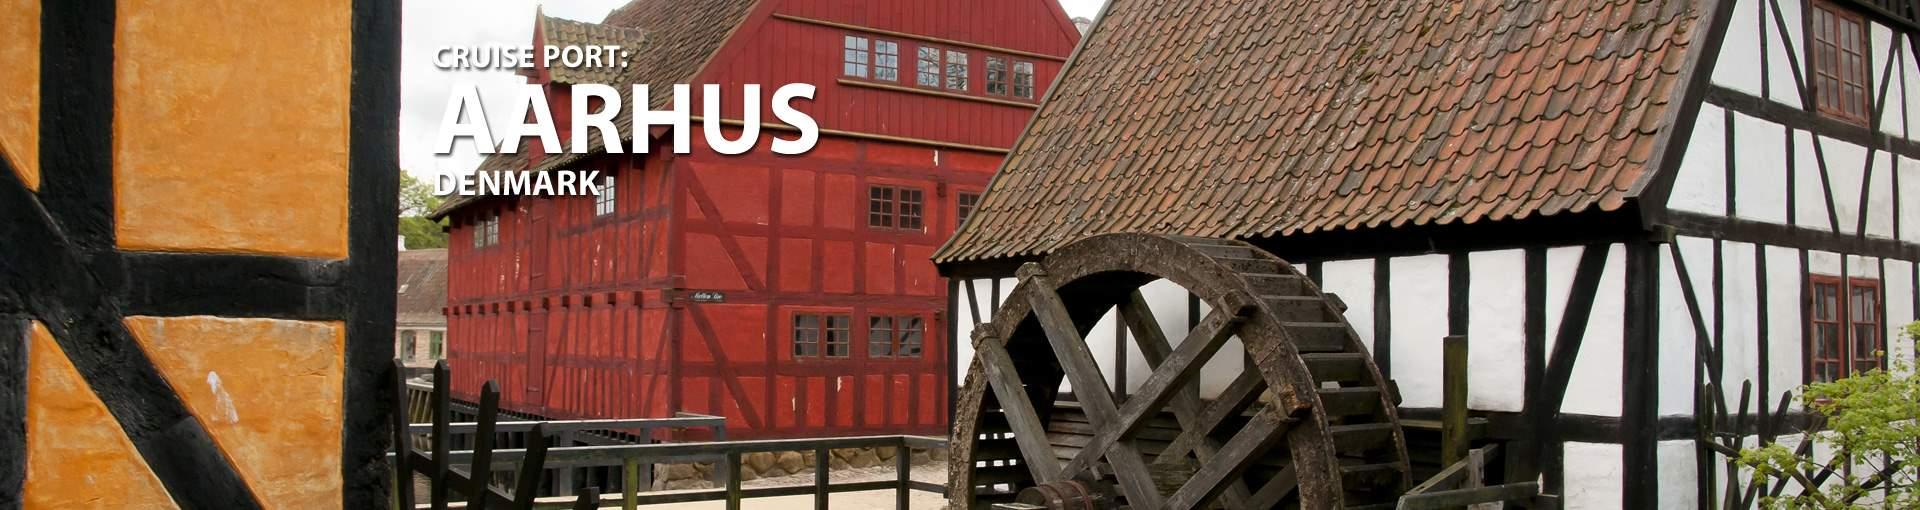 Cruises to Aarhus, Denmark